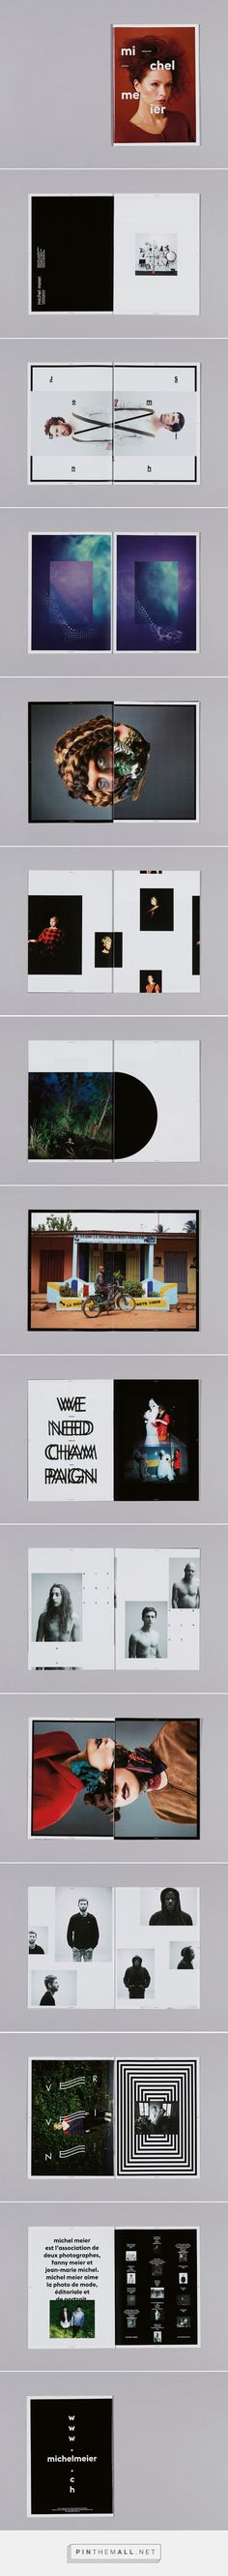 Michel Meier - Portfolio 2013 - A3 studio - created via http://pinthemall.net